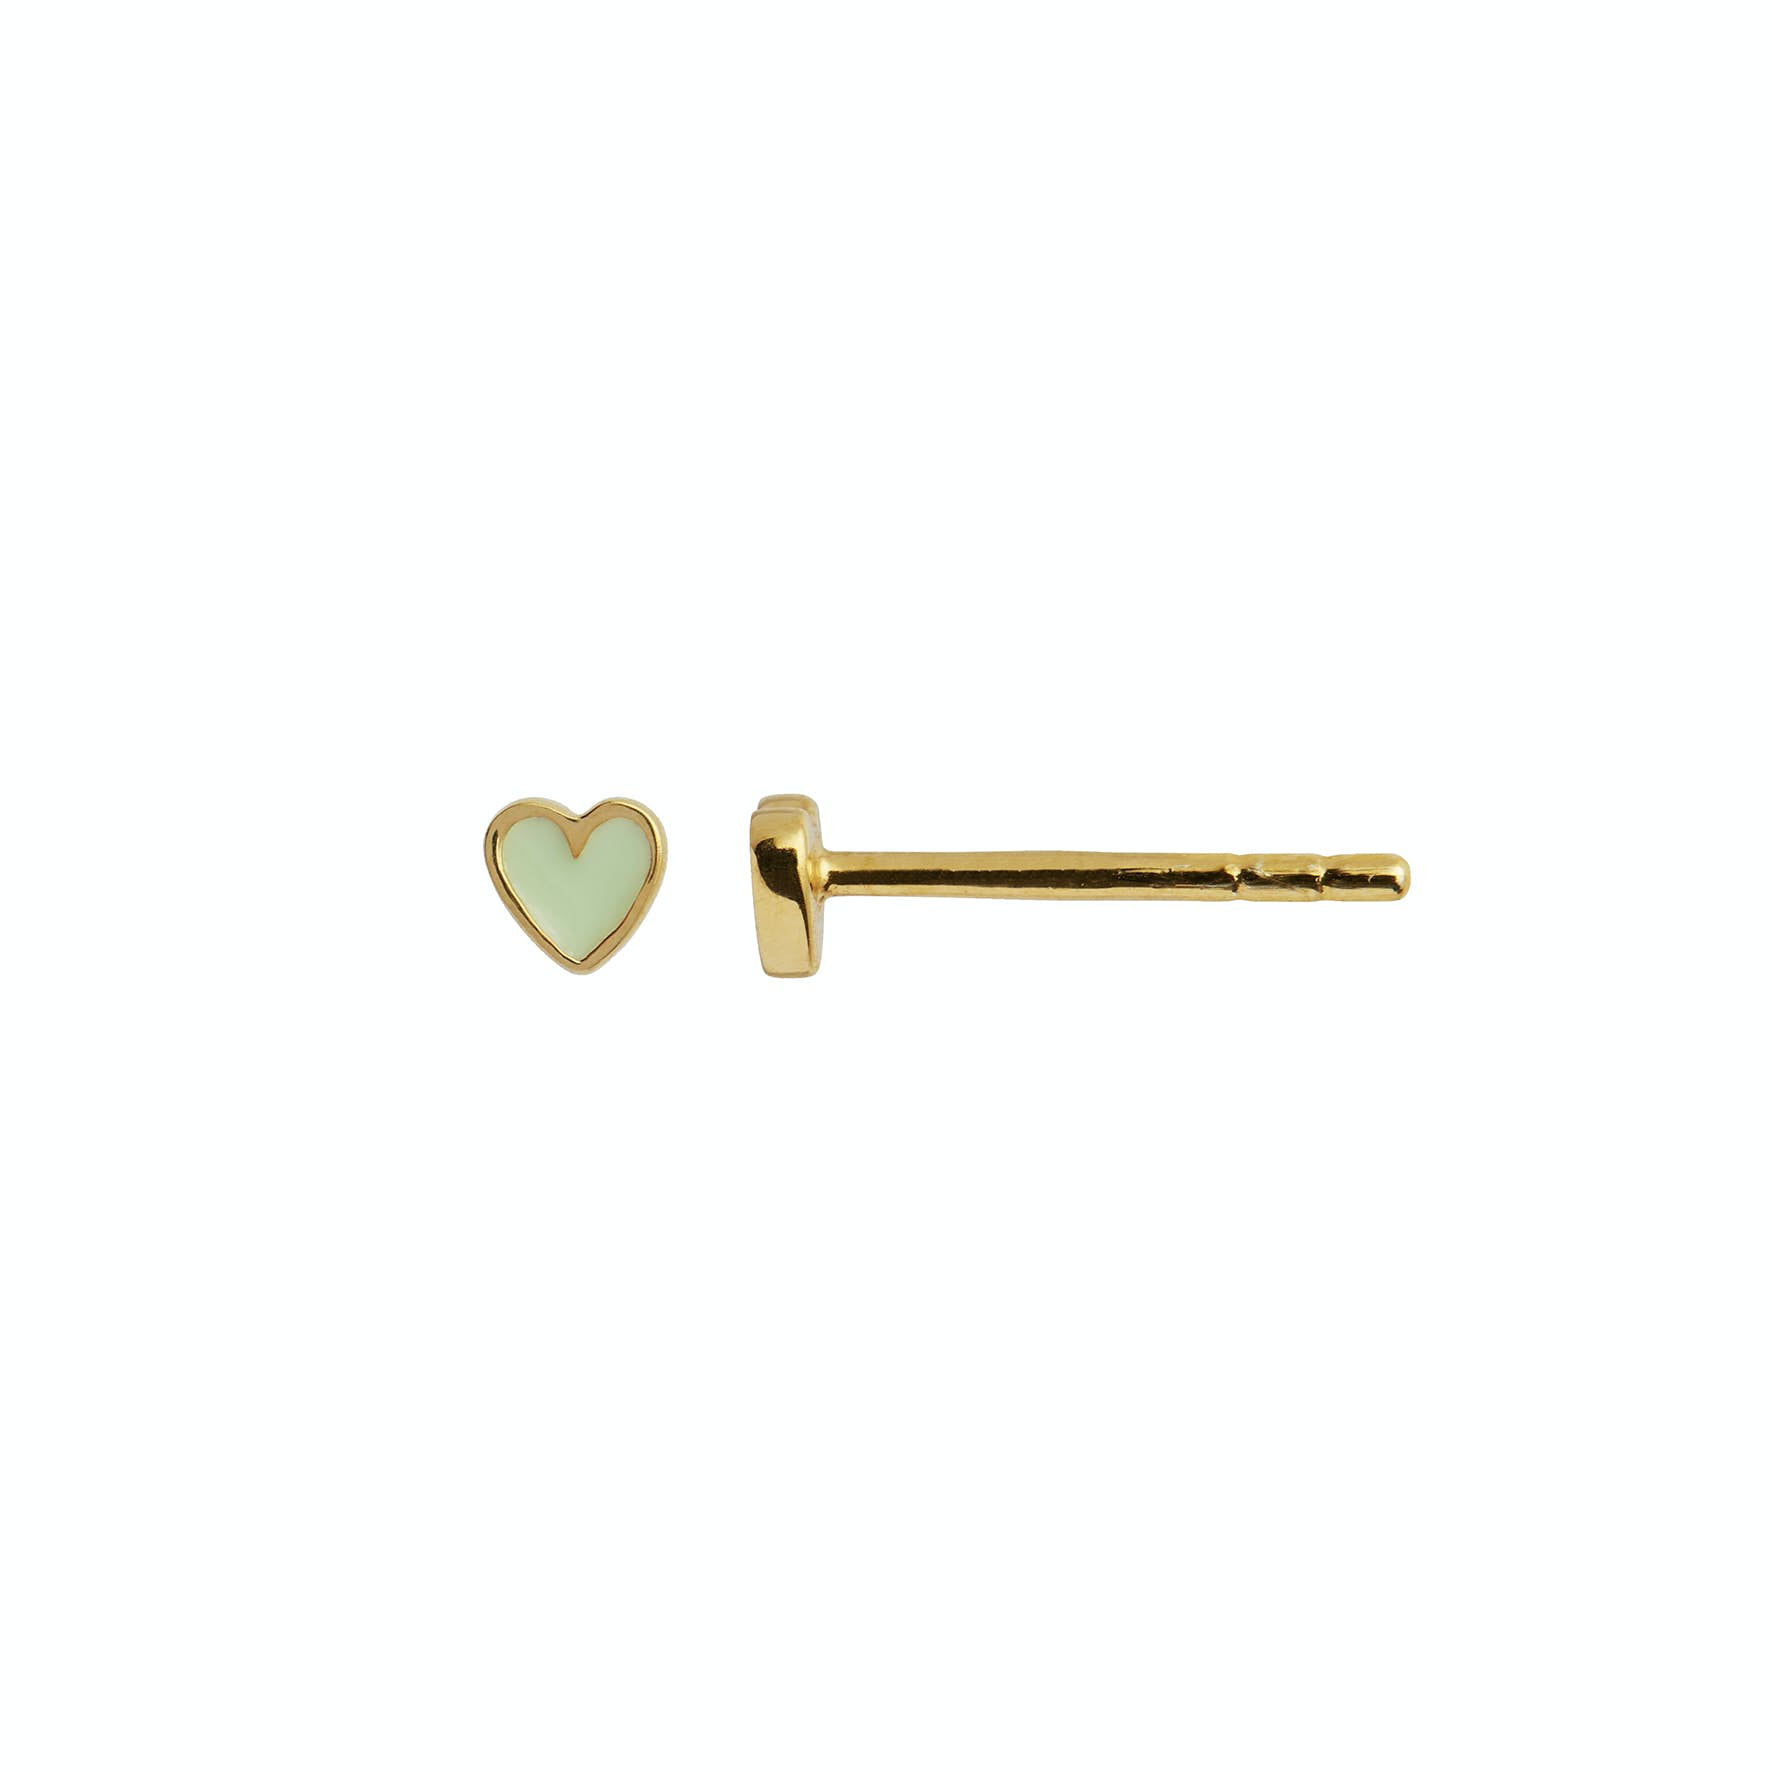 Petit Love Heart Earstick Olive Green fra STINE A Jewelry i Forgyldt-Sølv Sterling 925